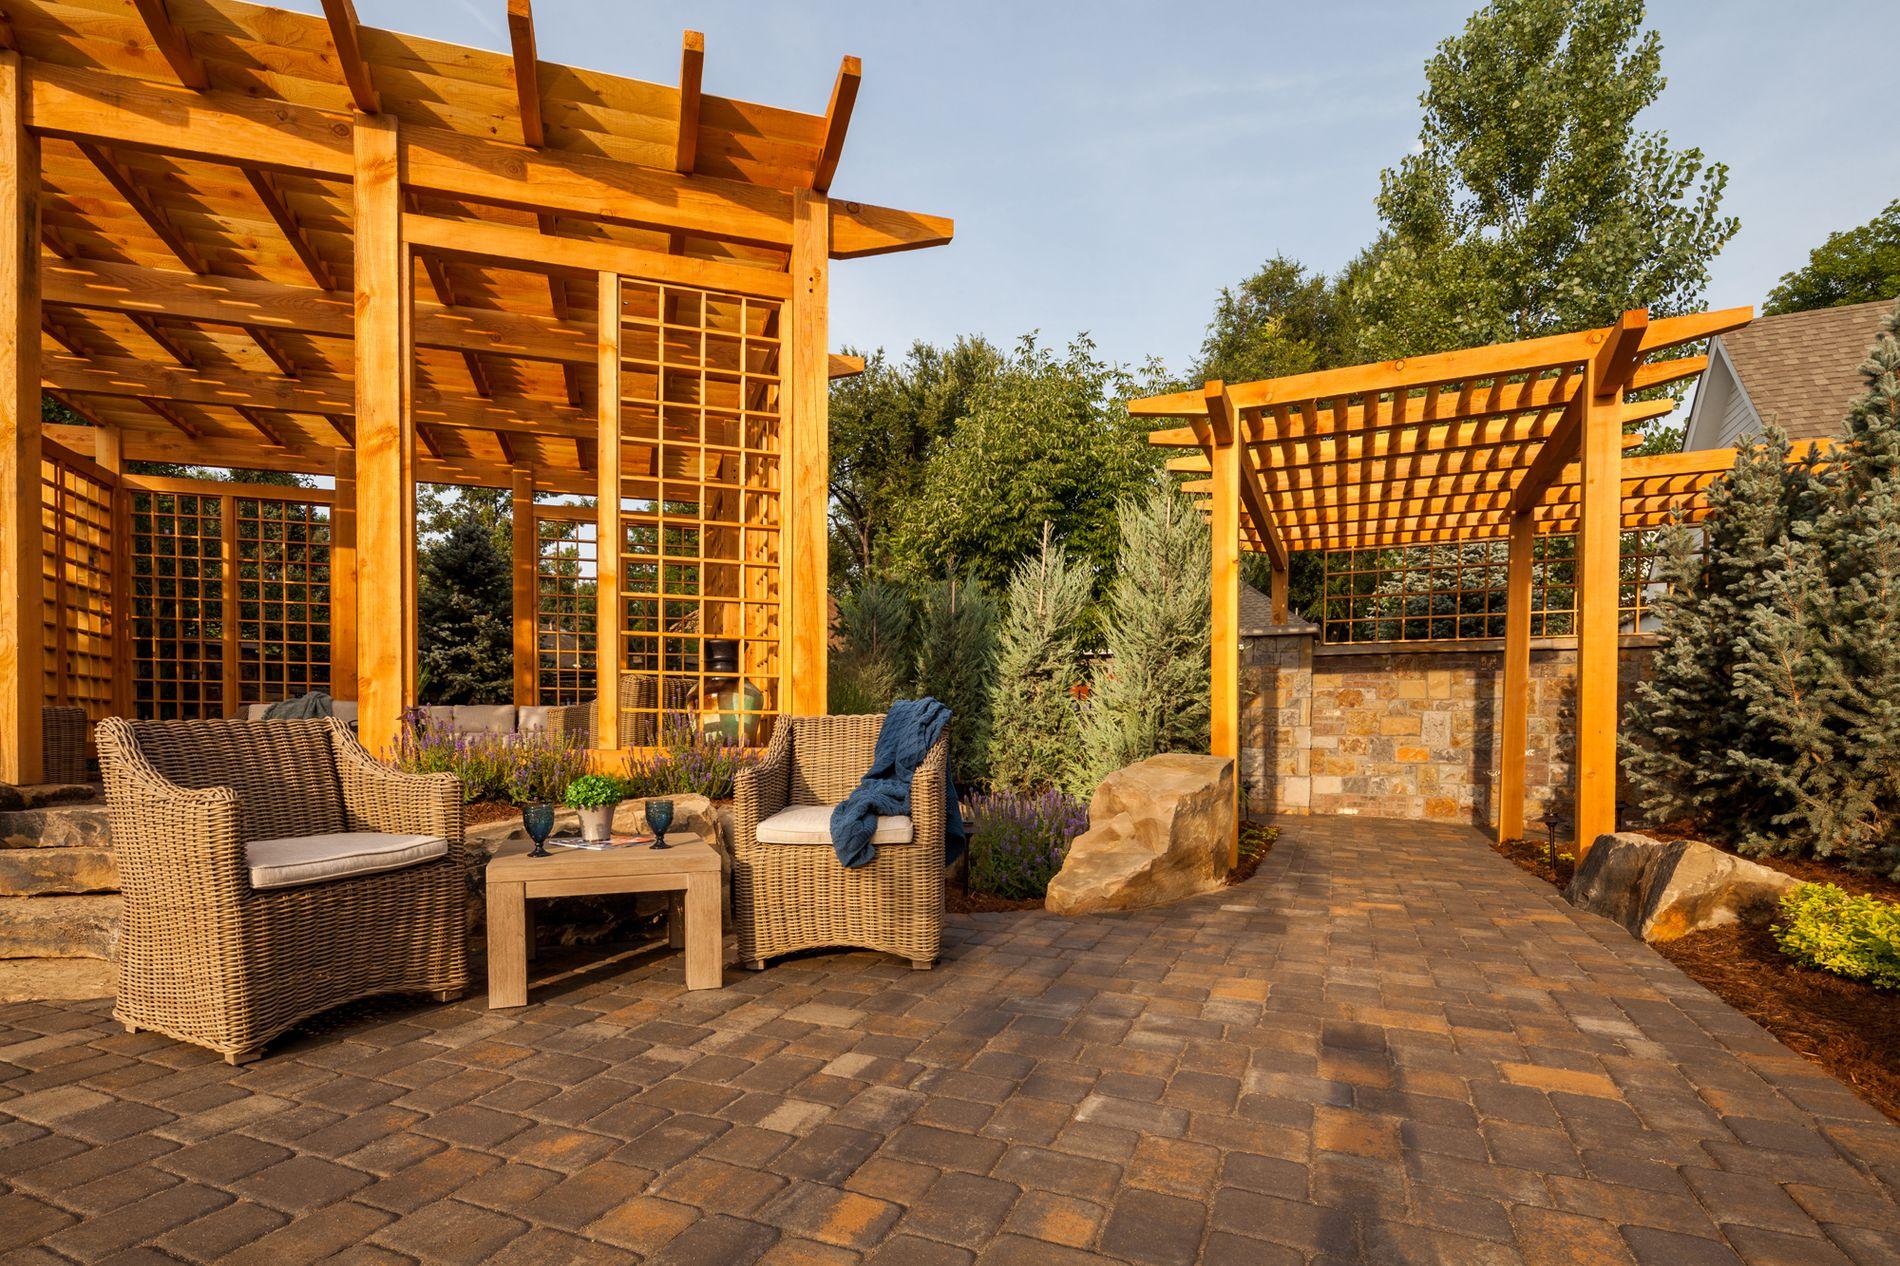 Concrete paver patio with pergola